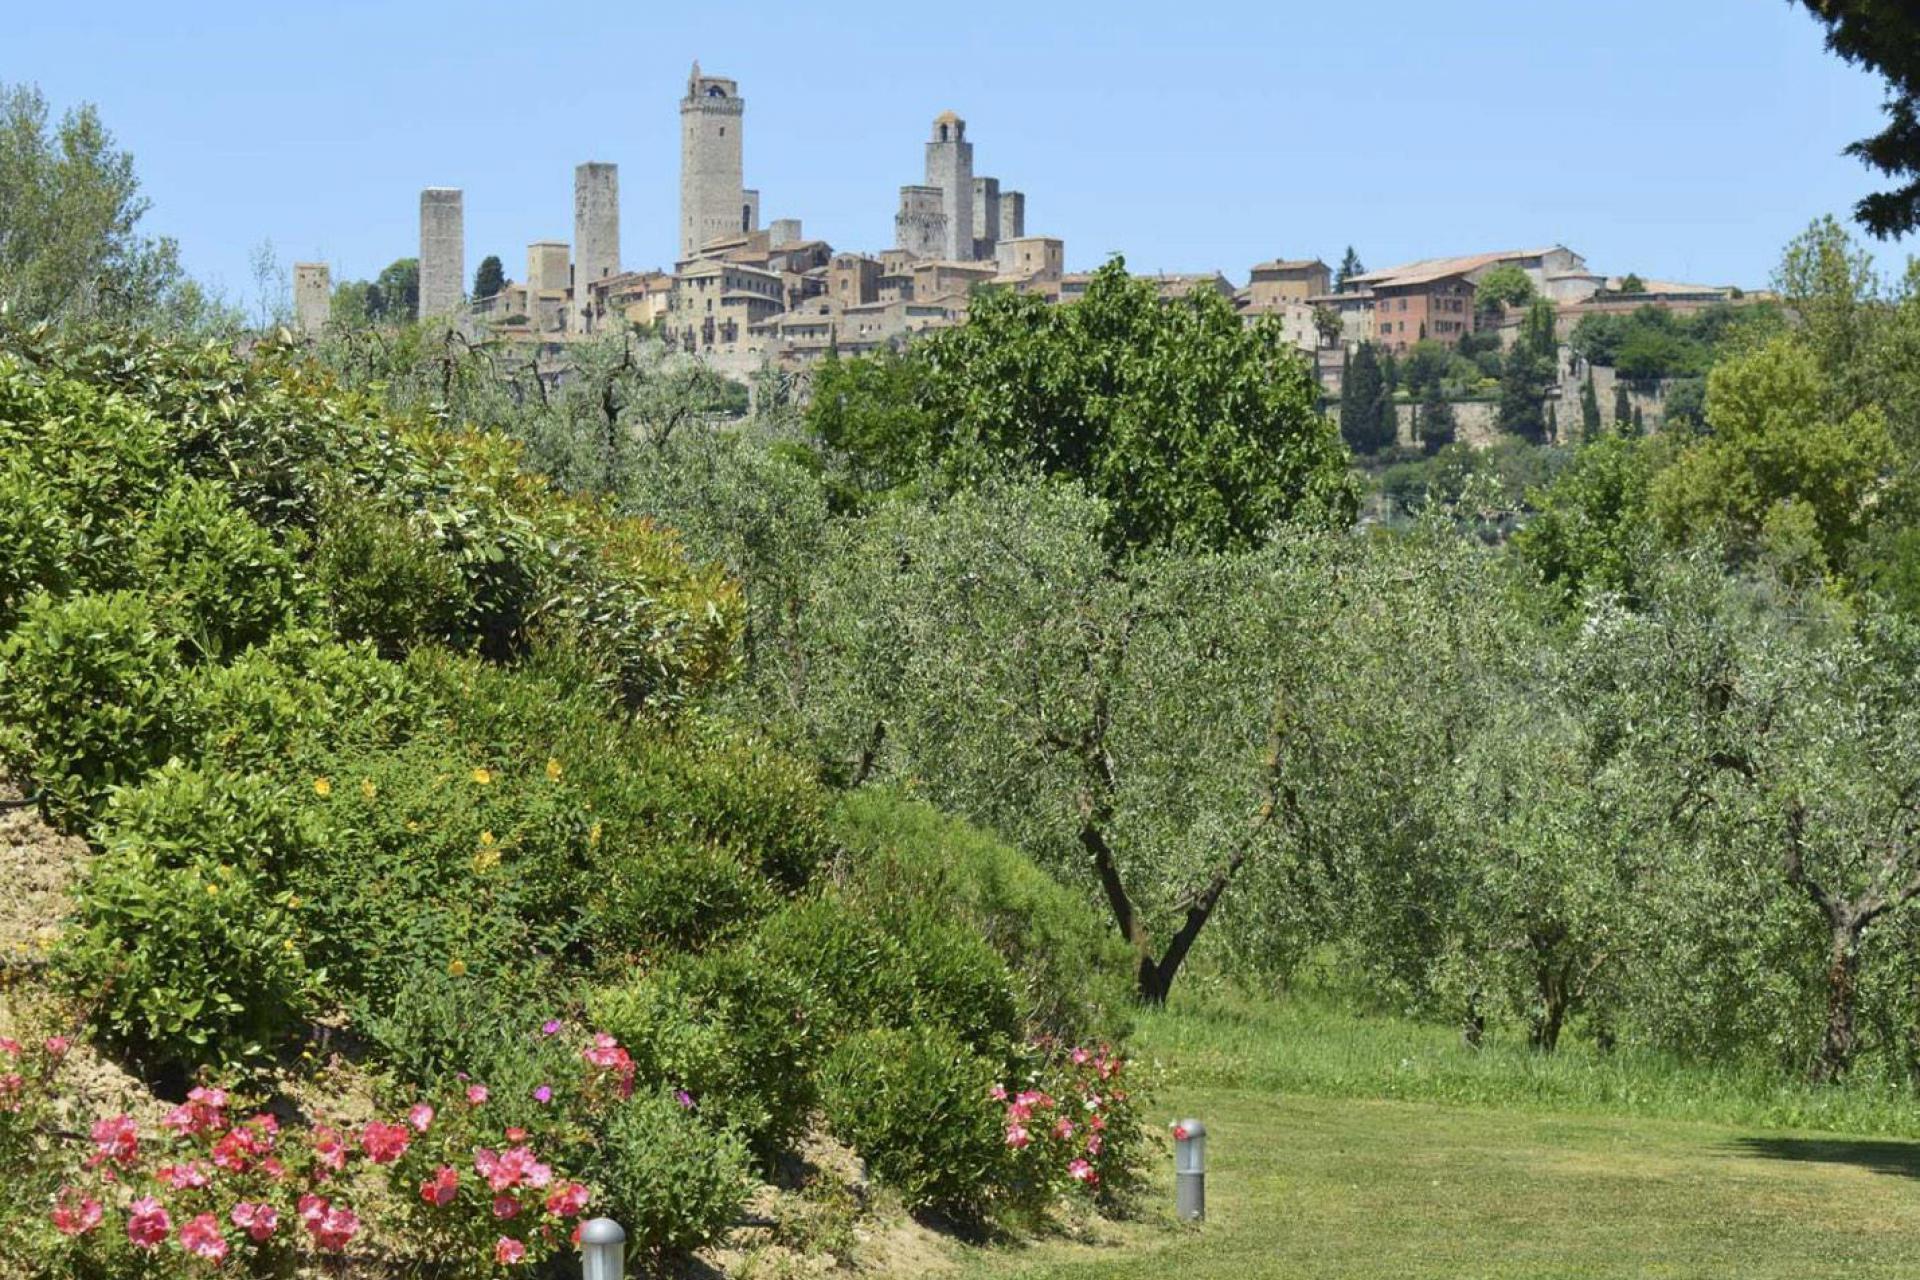 Agriturismo Toscane Romantische agriturismo met uitzicht op San Gimignano